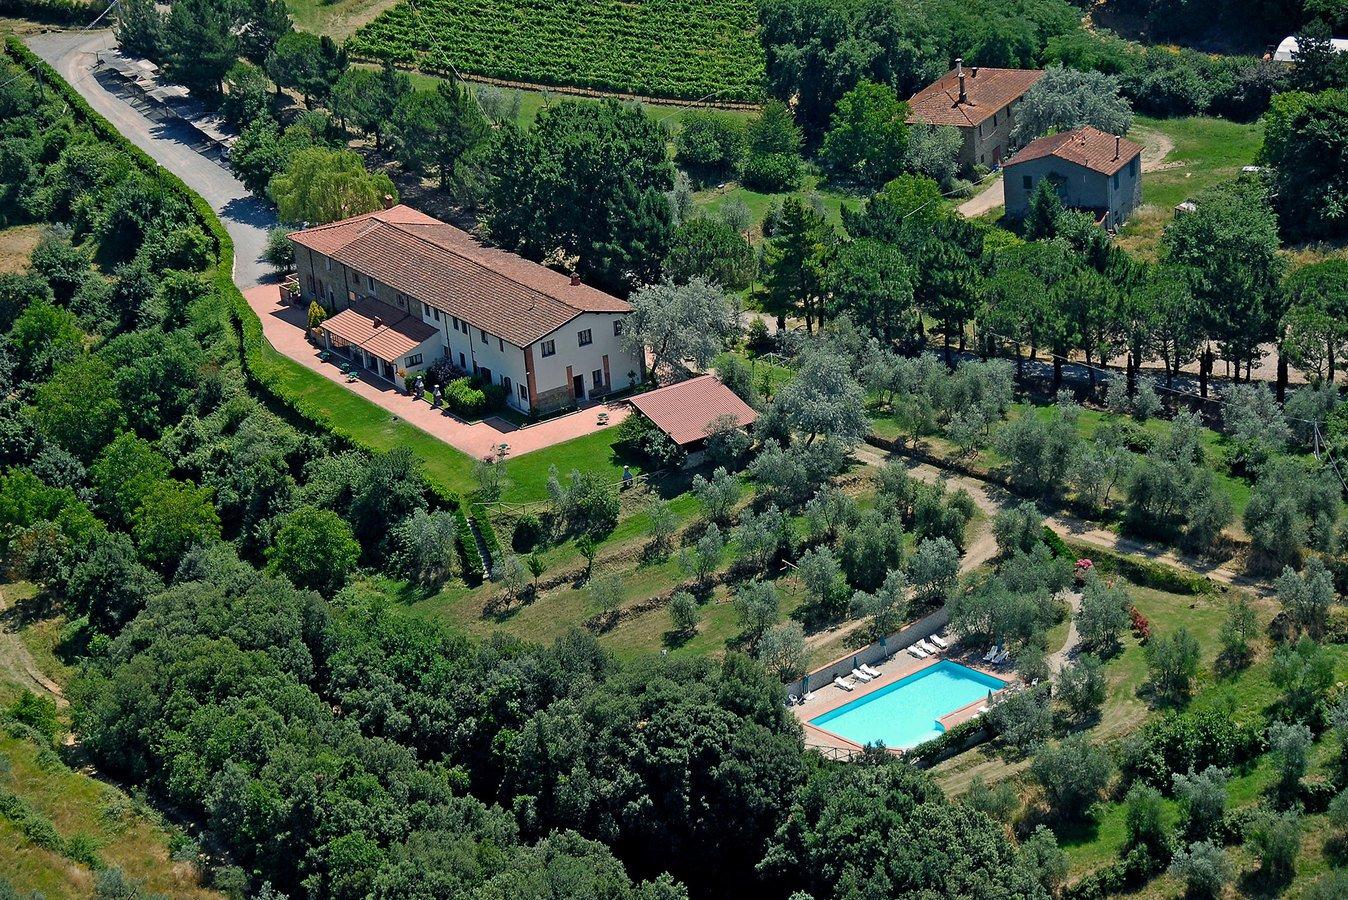 Offerte Agriturismi Toscana con Piscina - Poggitazzi